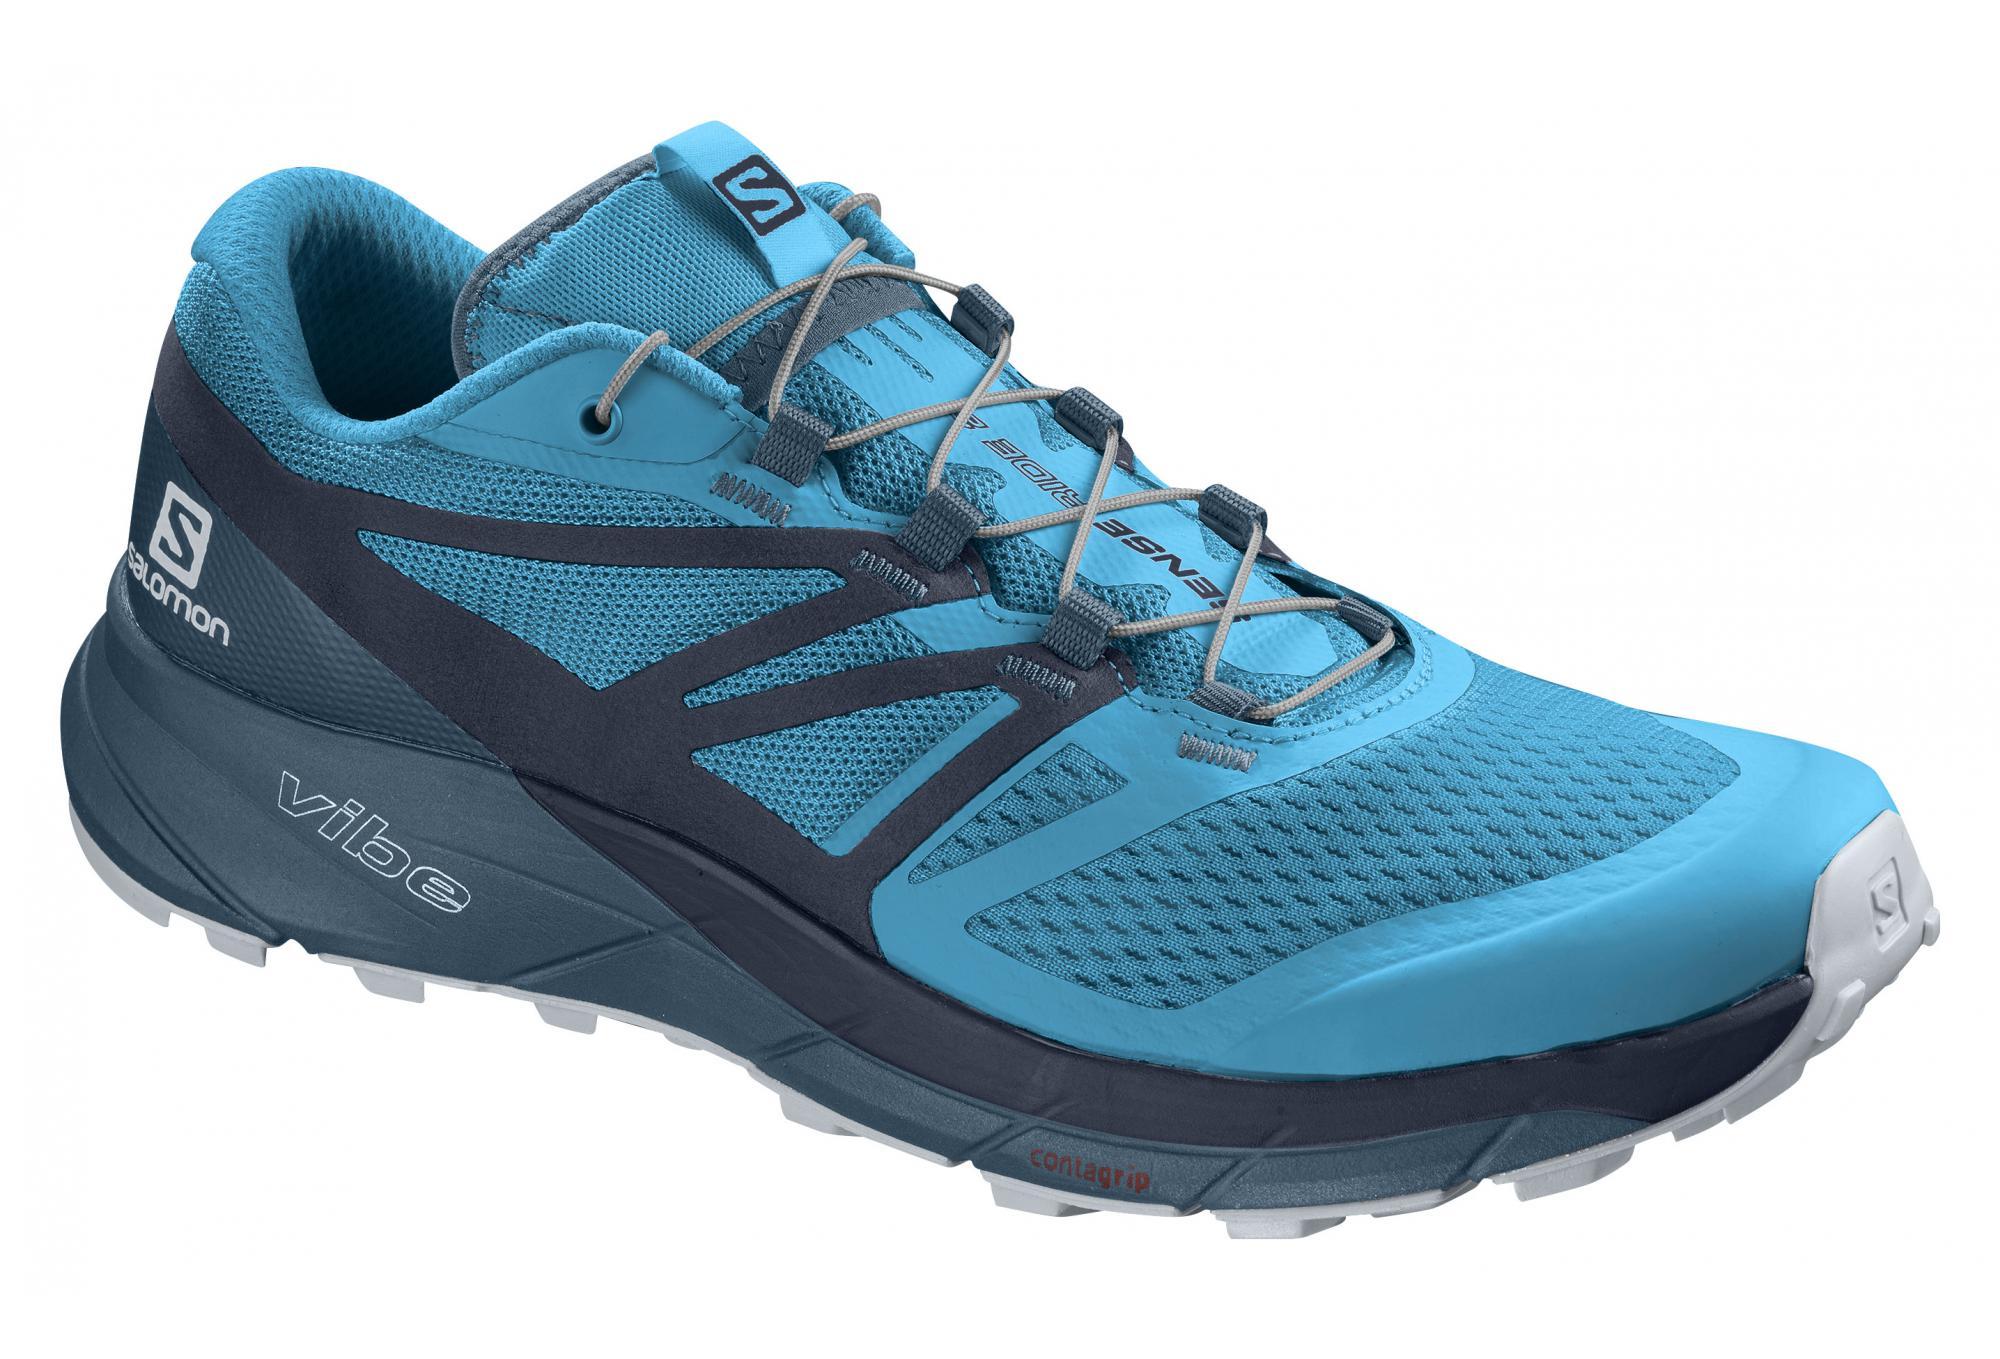 Salomon Sense Ride 2 Shoes Blue